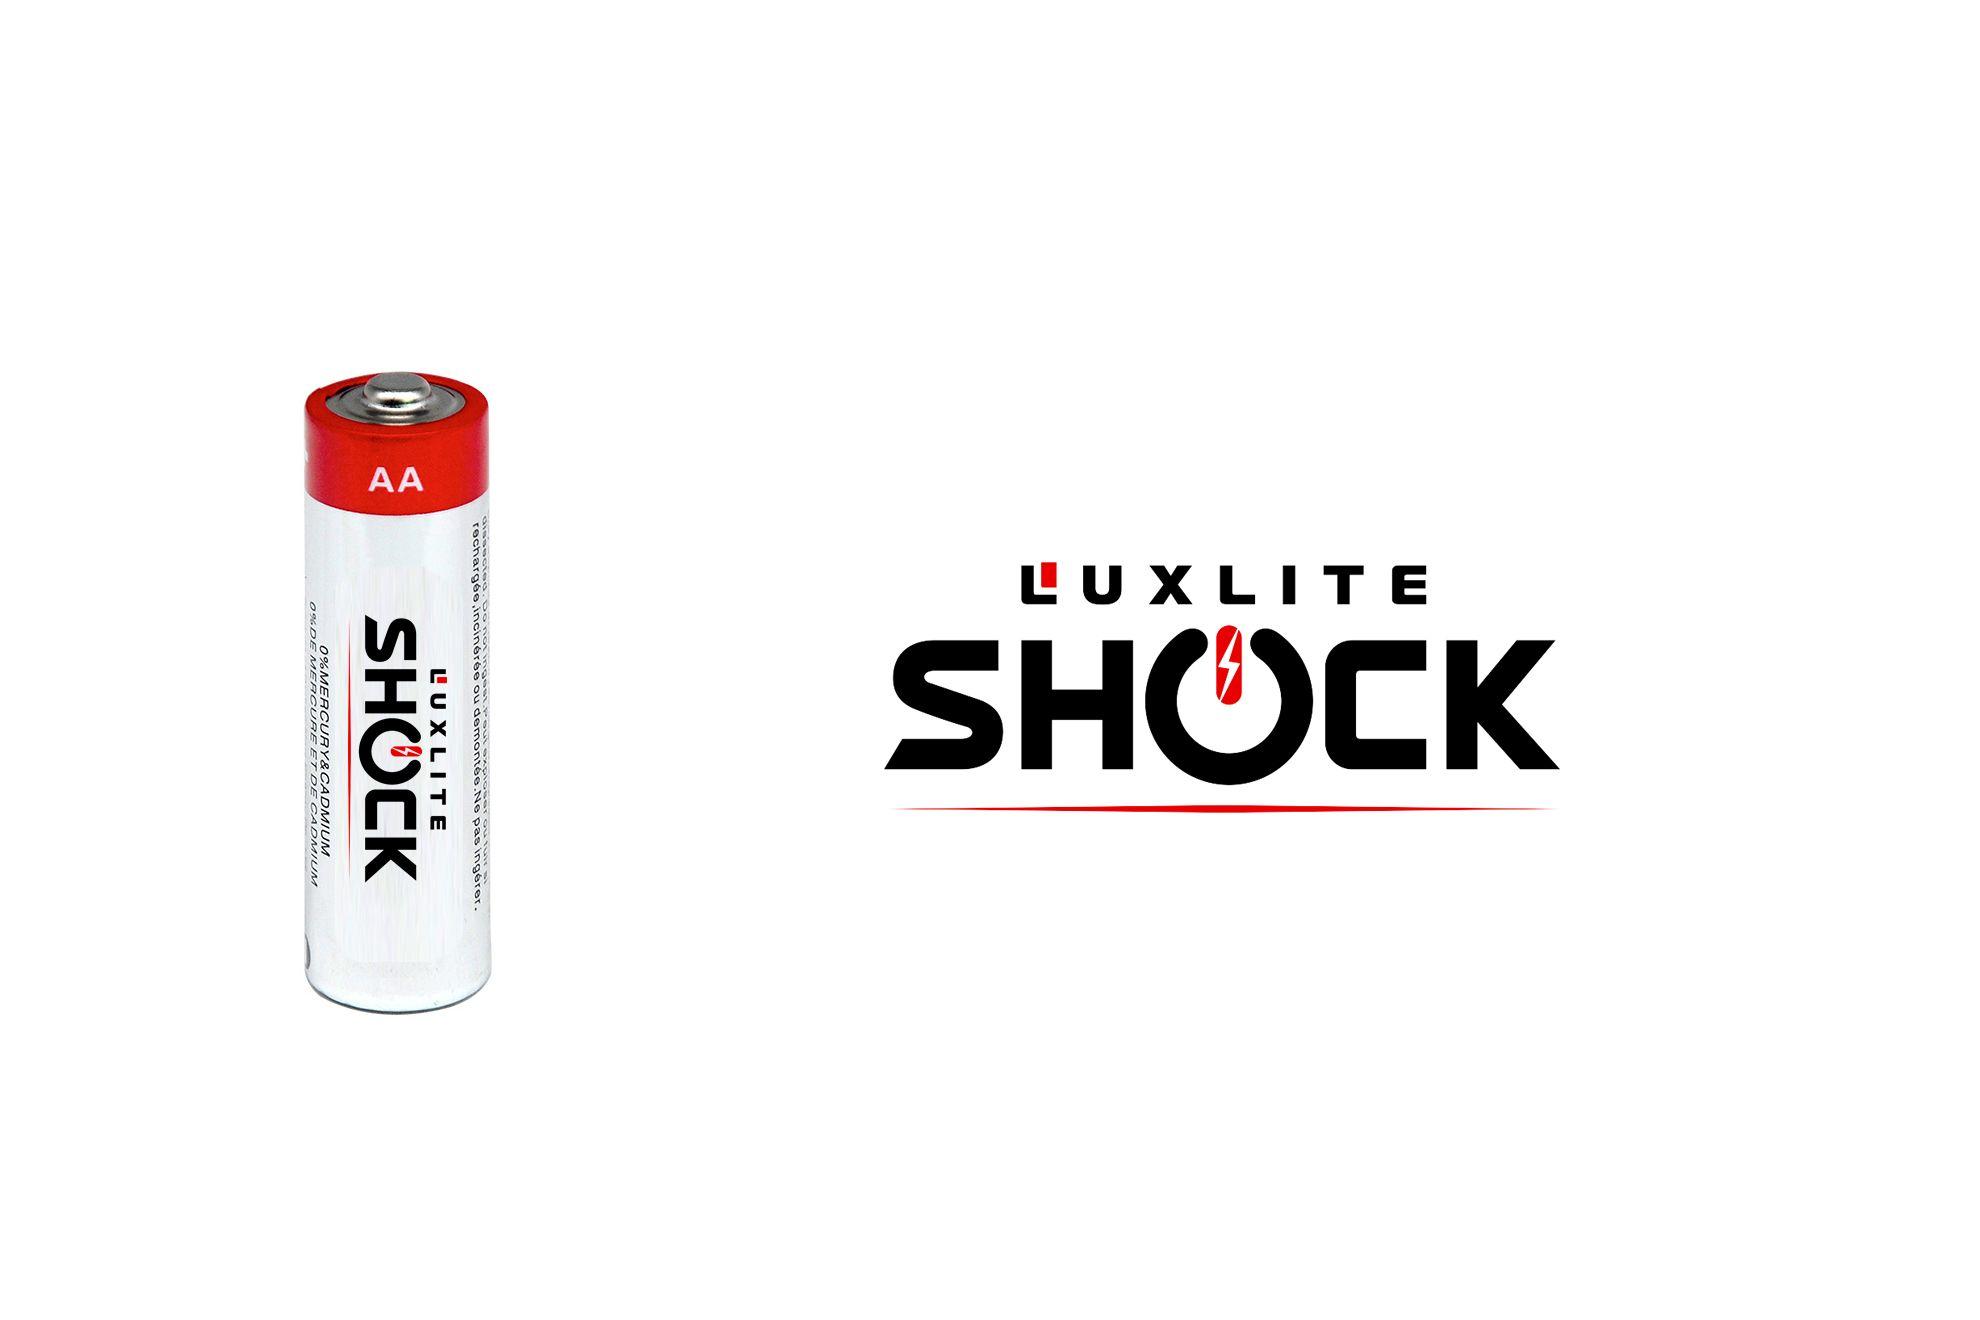 Логотип для батареек LUXLITE SHOCK - дизайнер JMarcus